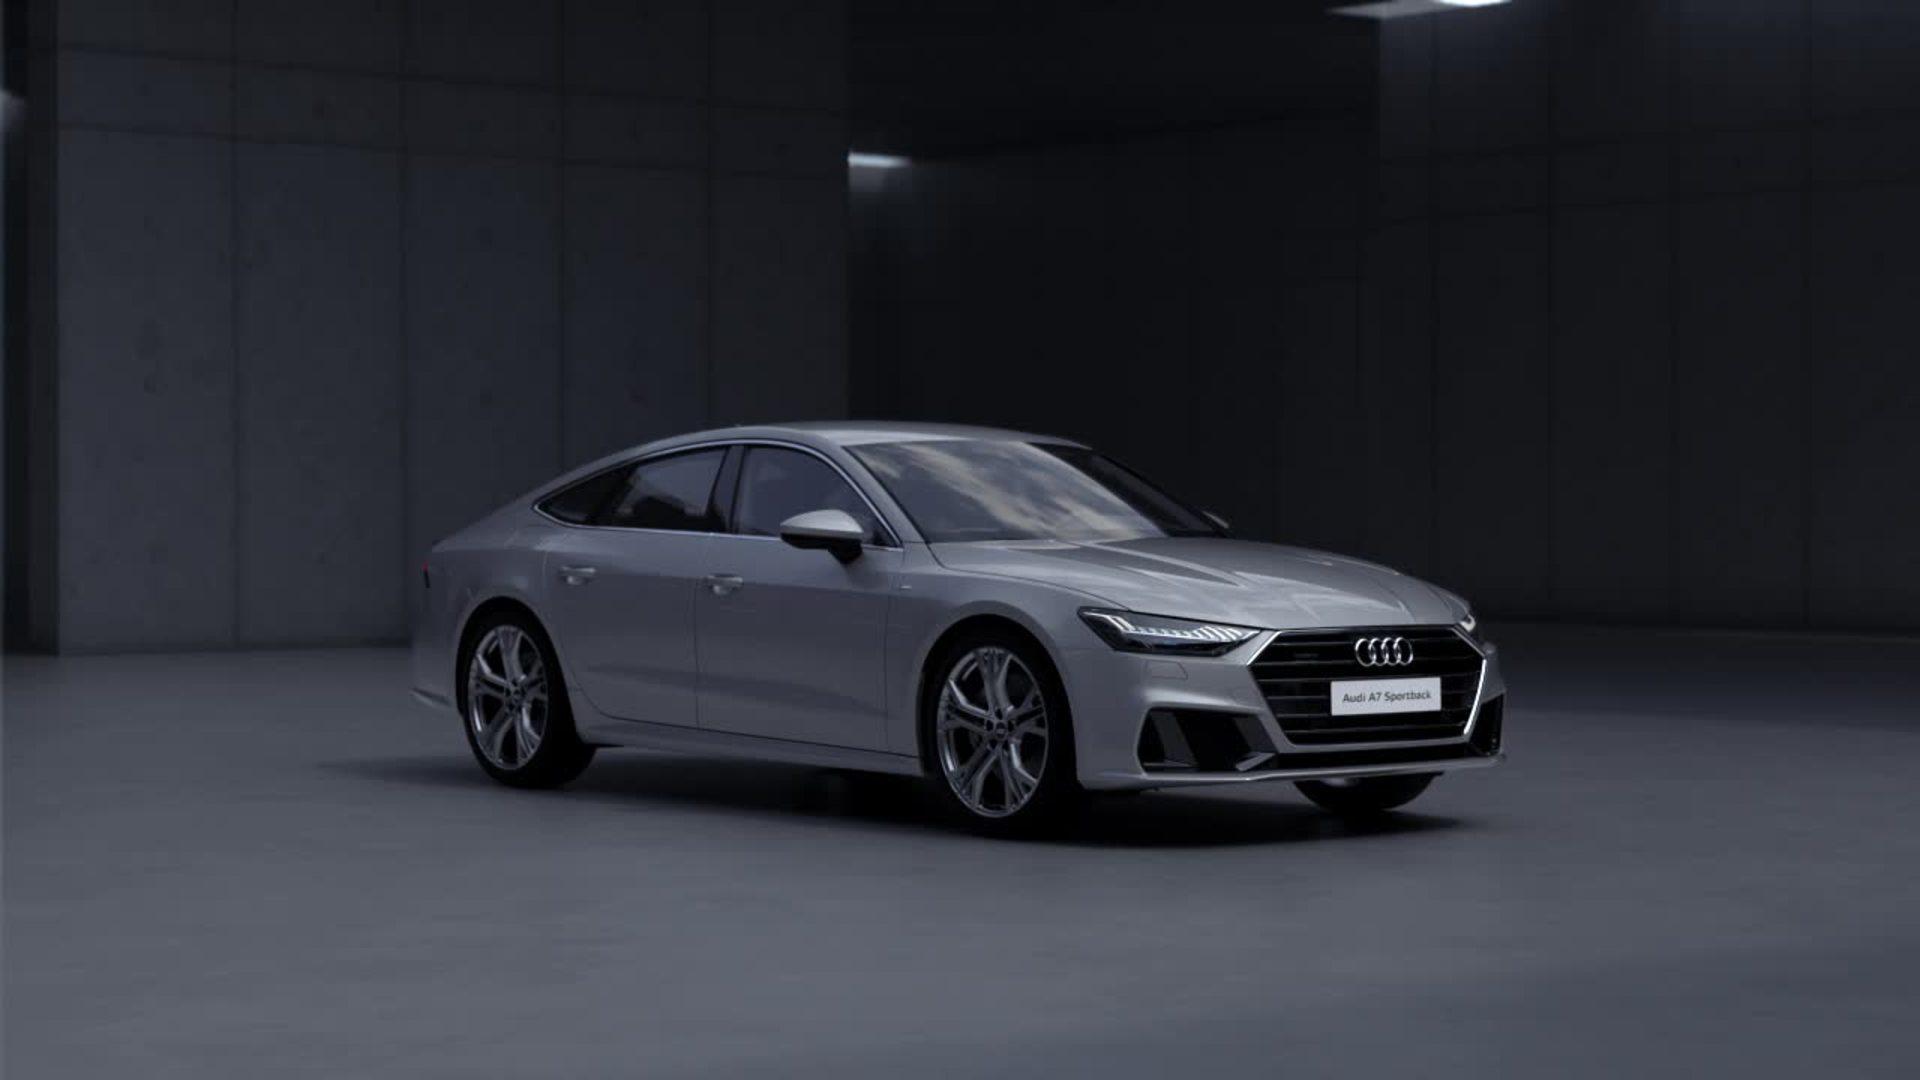 Animation Audi A7 2017 exterior